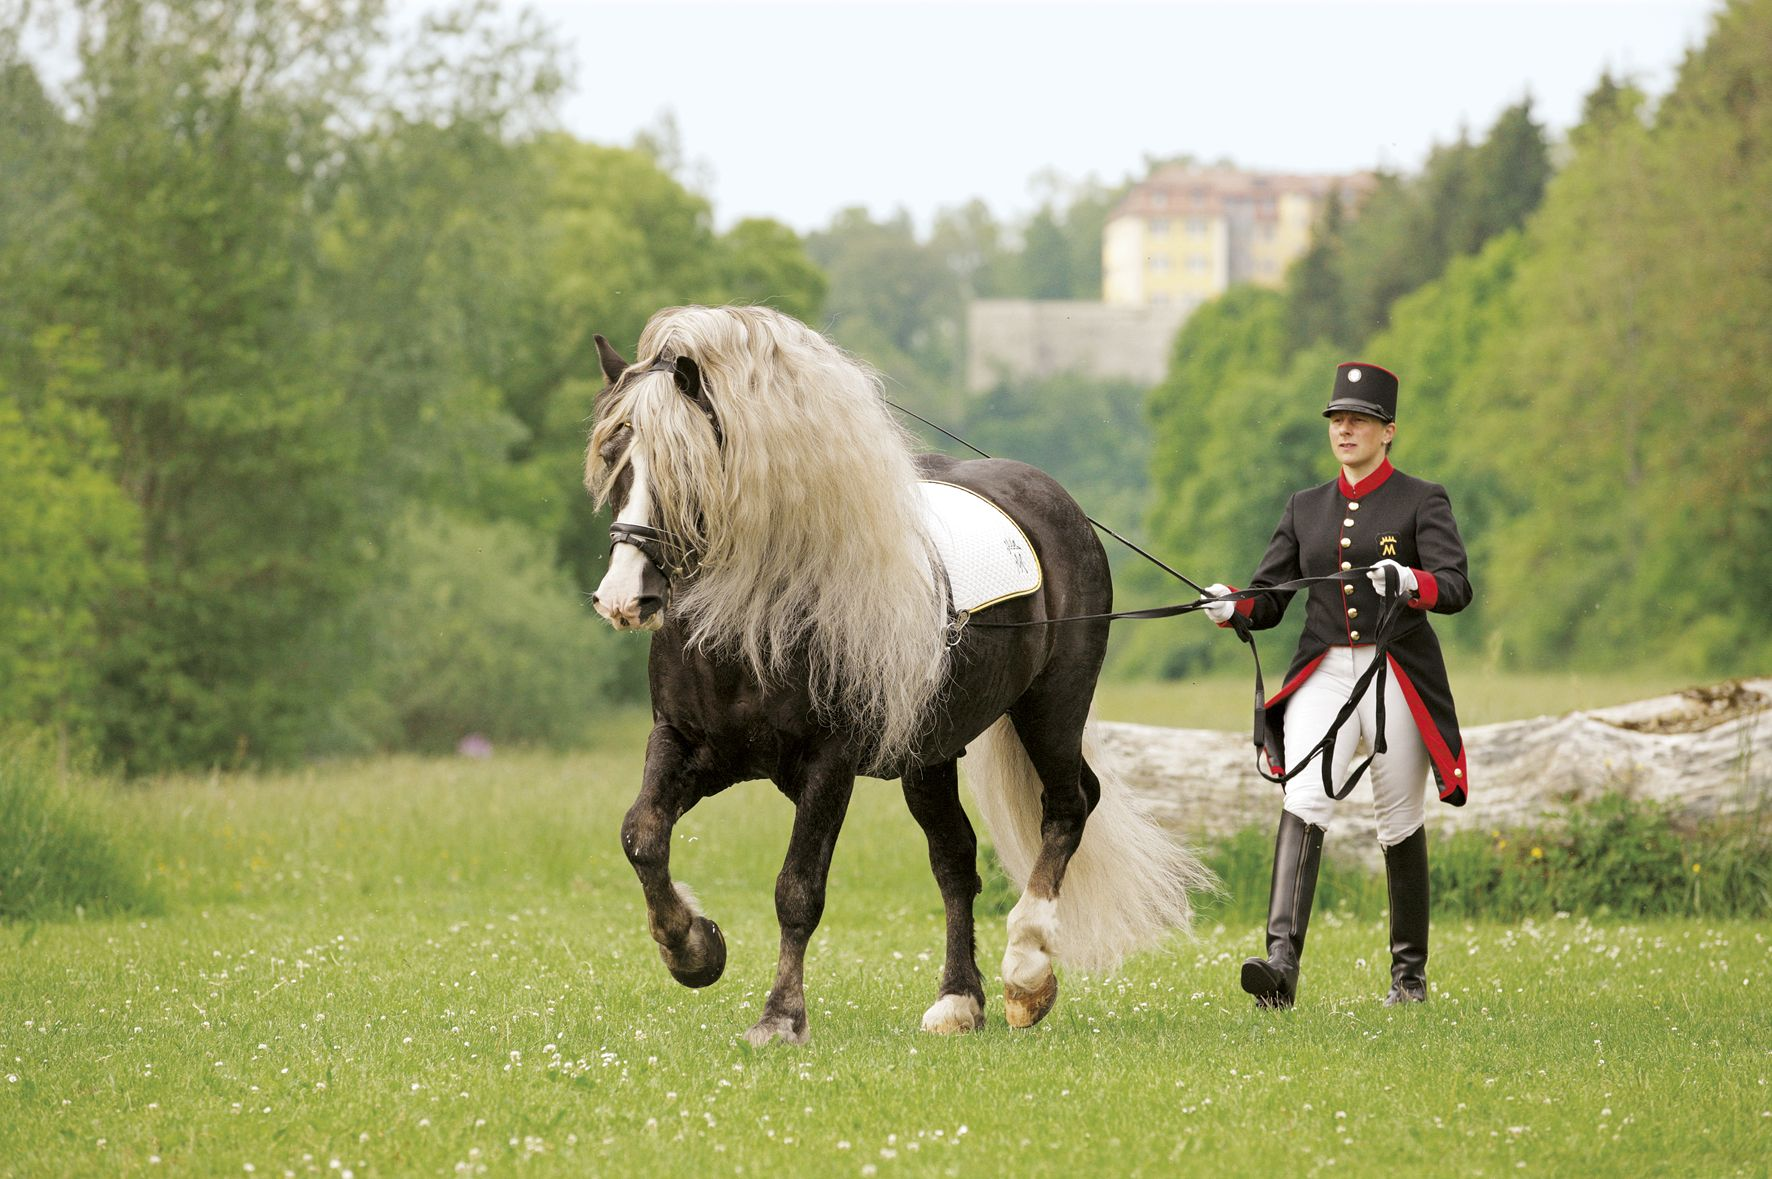 pferde kaltbl ter schwarzw lder pferde kaltb ter darft horses cavalos sangue quente vs. Black Bedroom Furniture Sets. Home Design Ideas